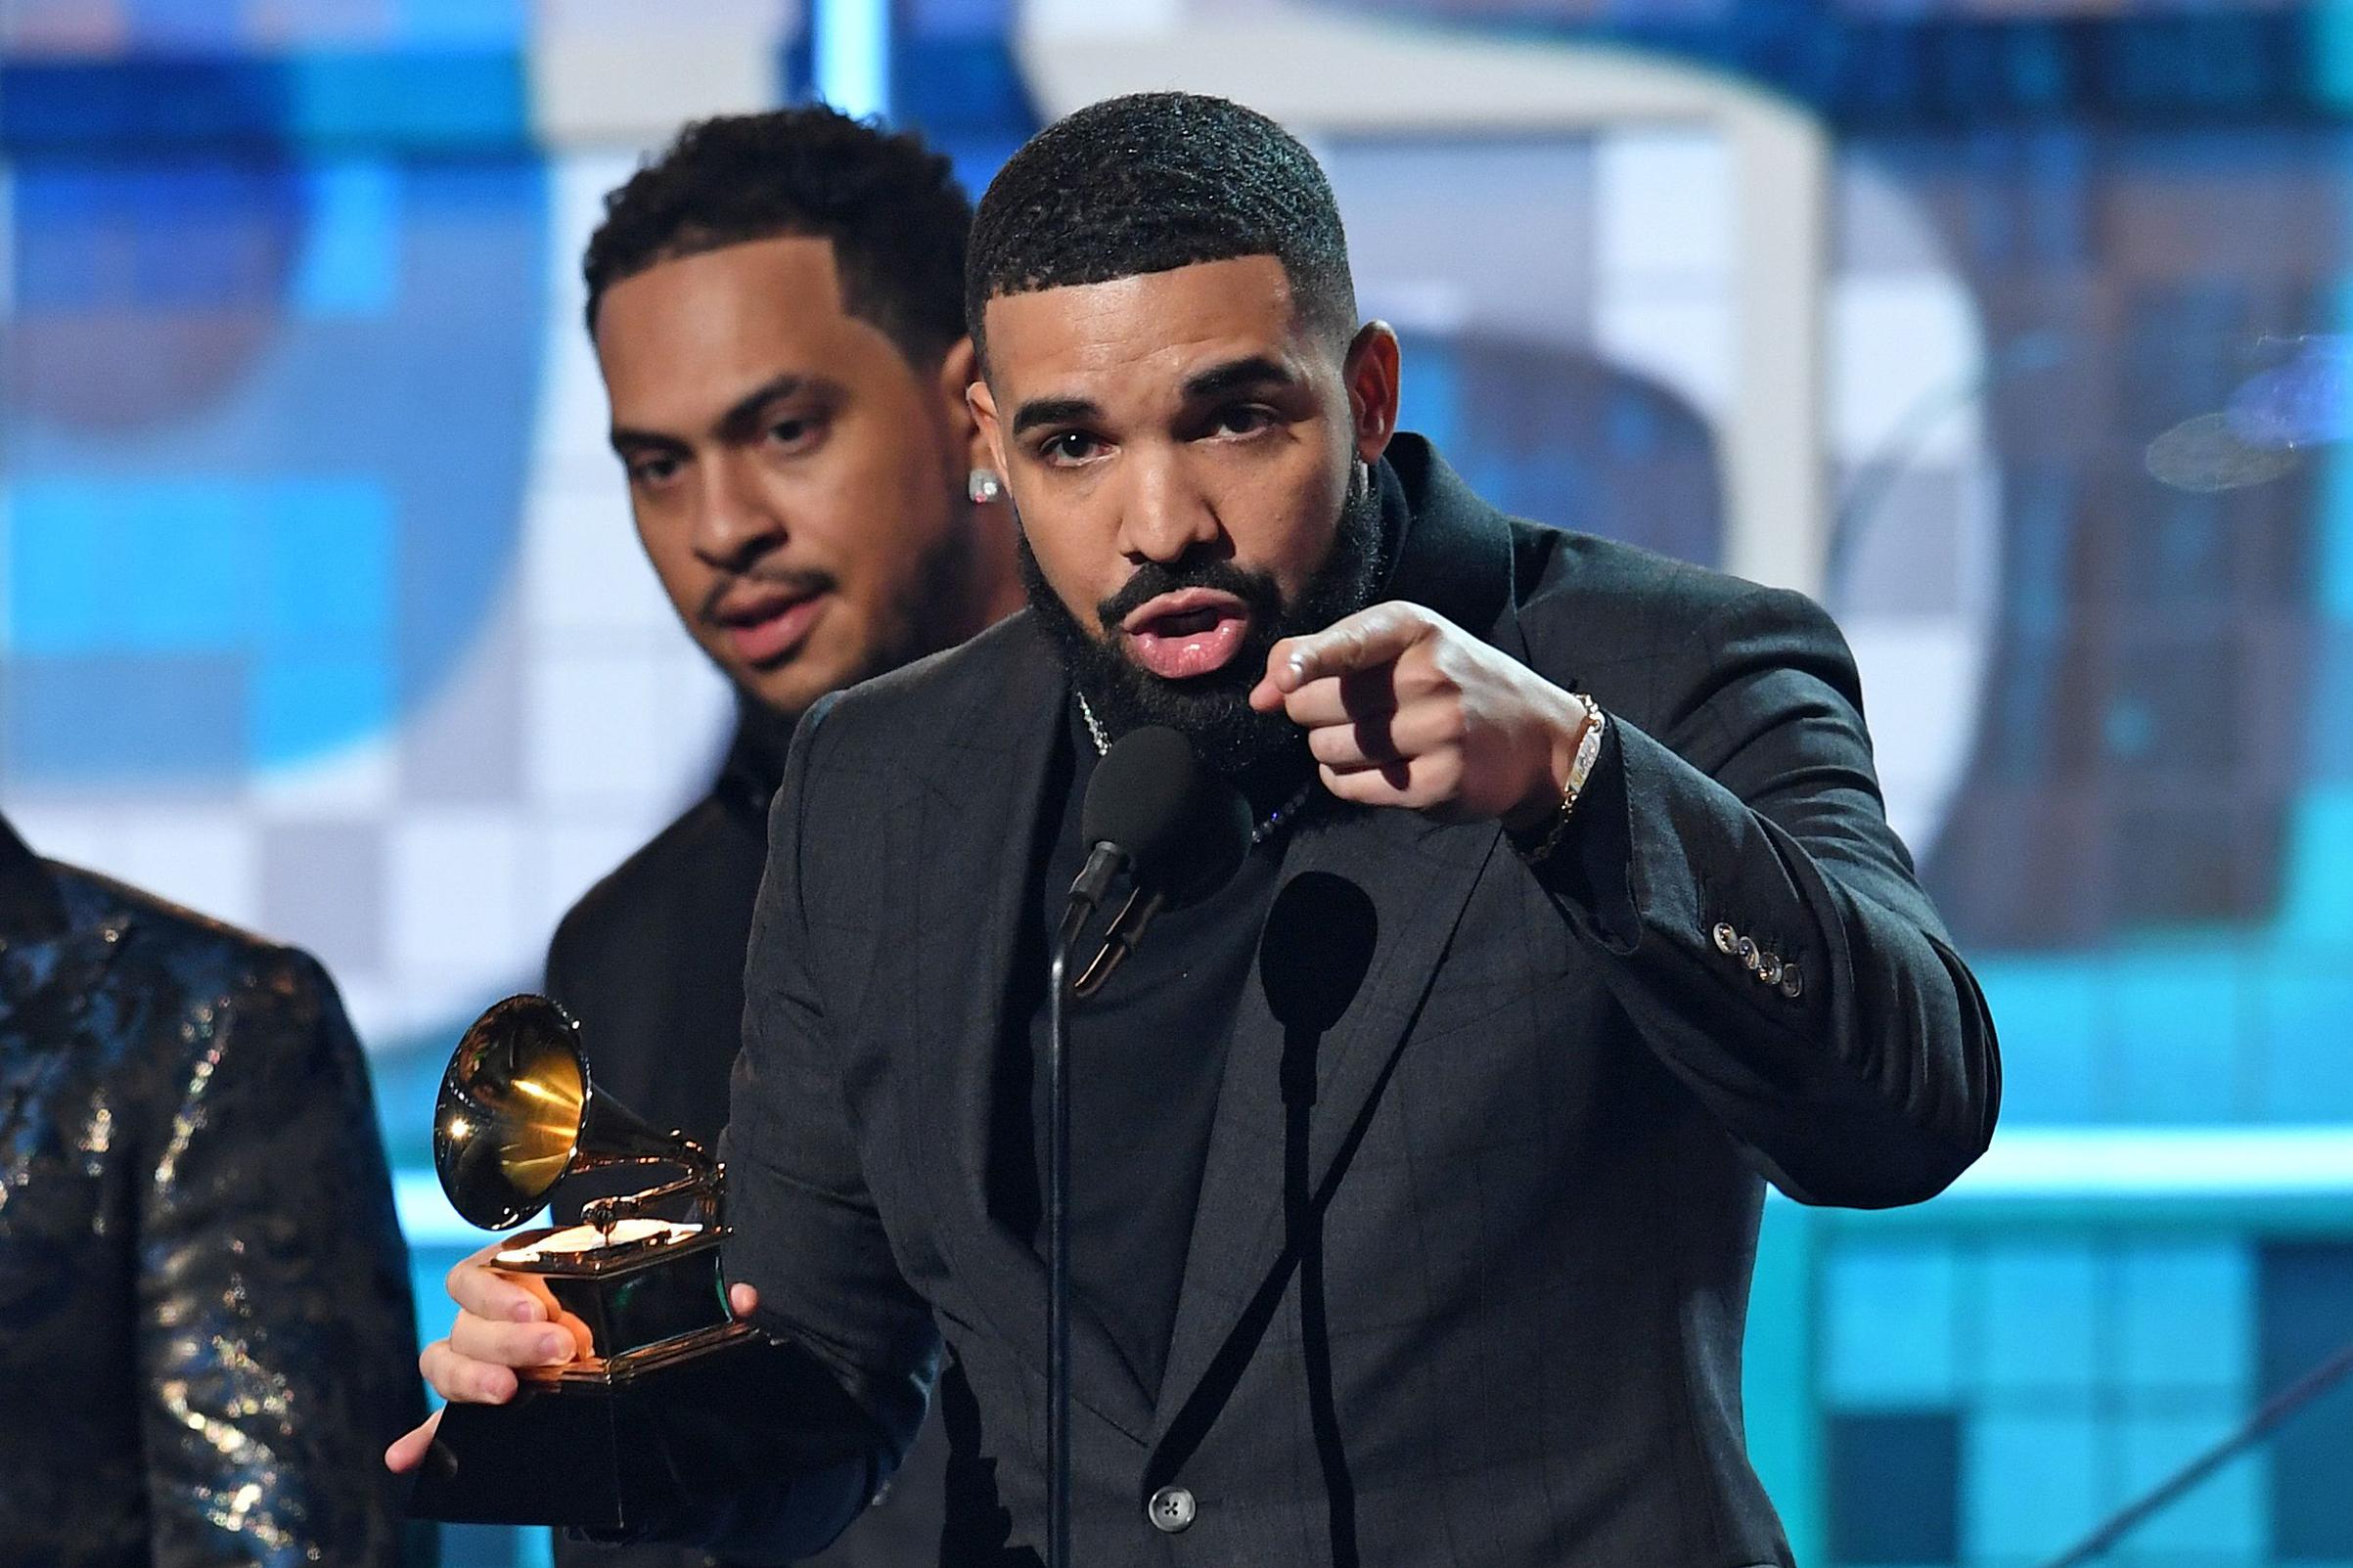 Drake S Grammy Acceptance Speech Threw Shade At The Grammys Time